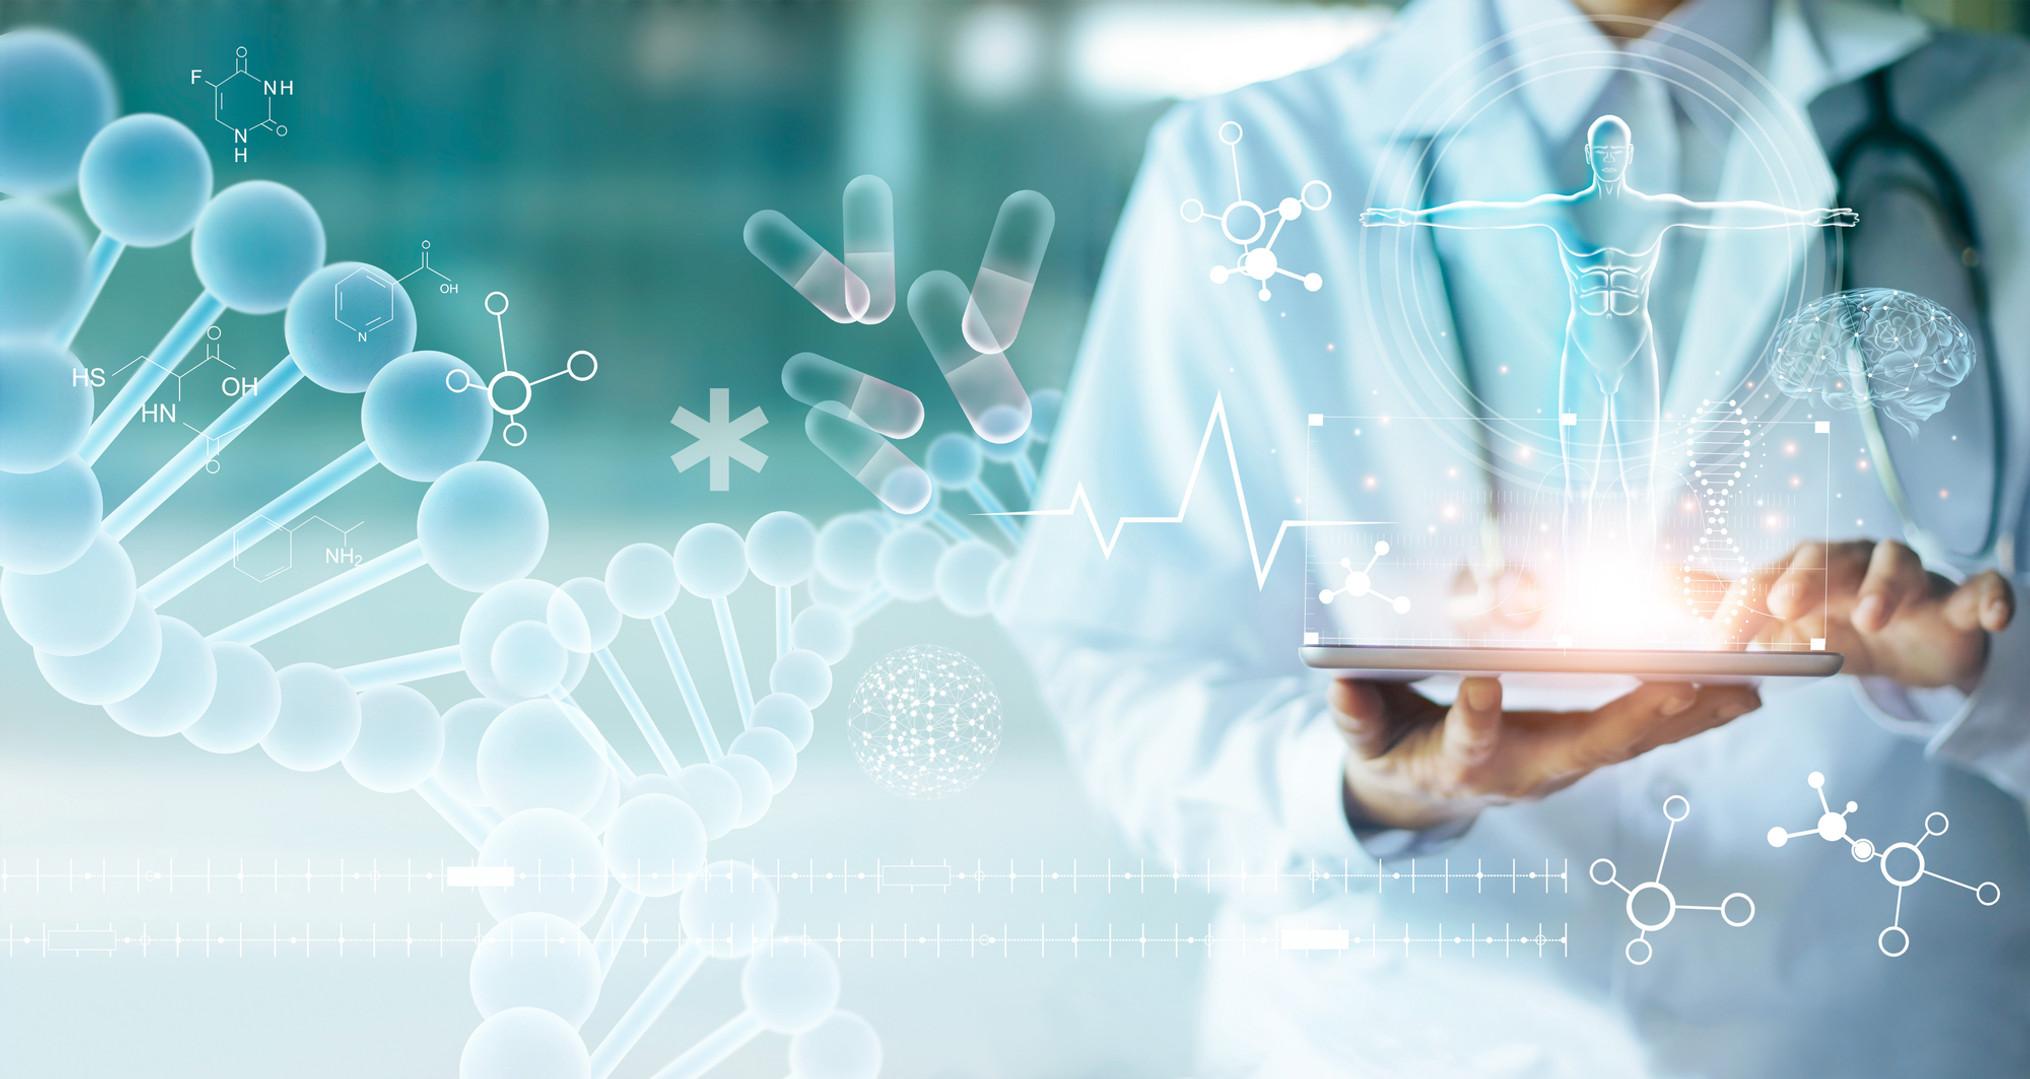 The Next Evolution of Medicine